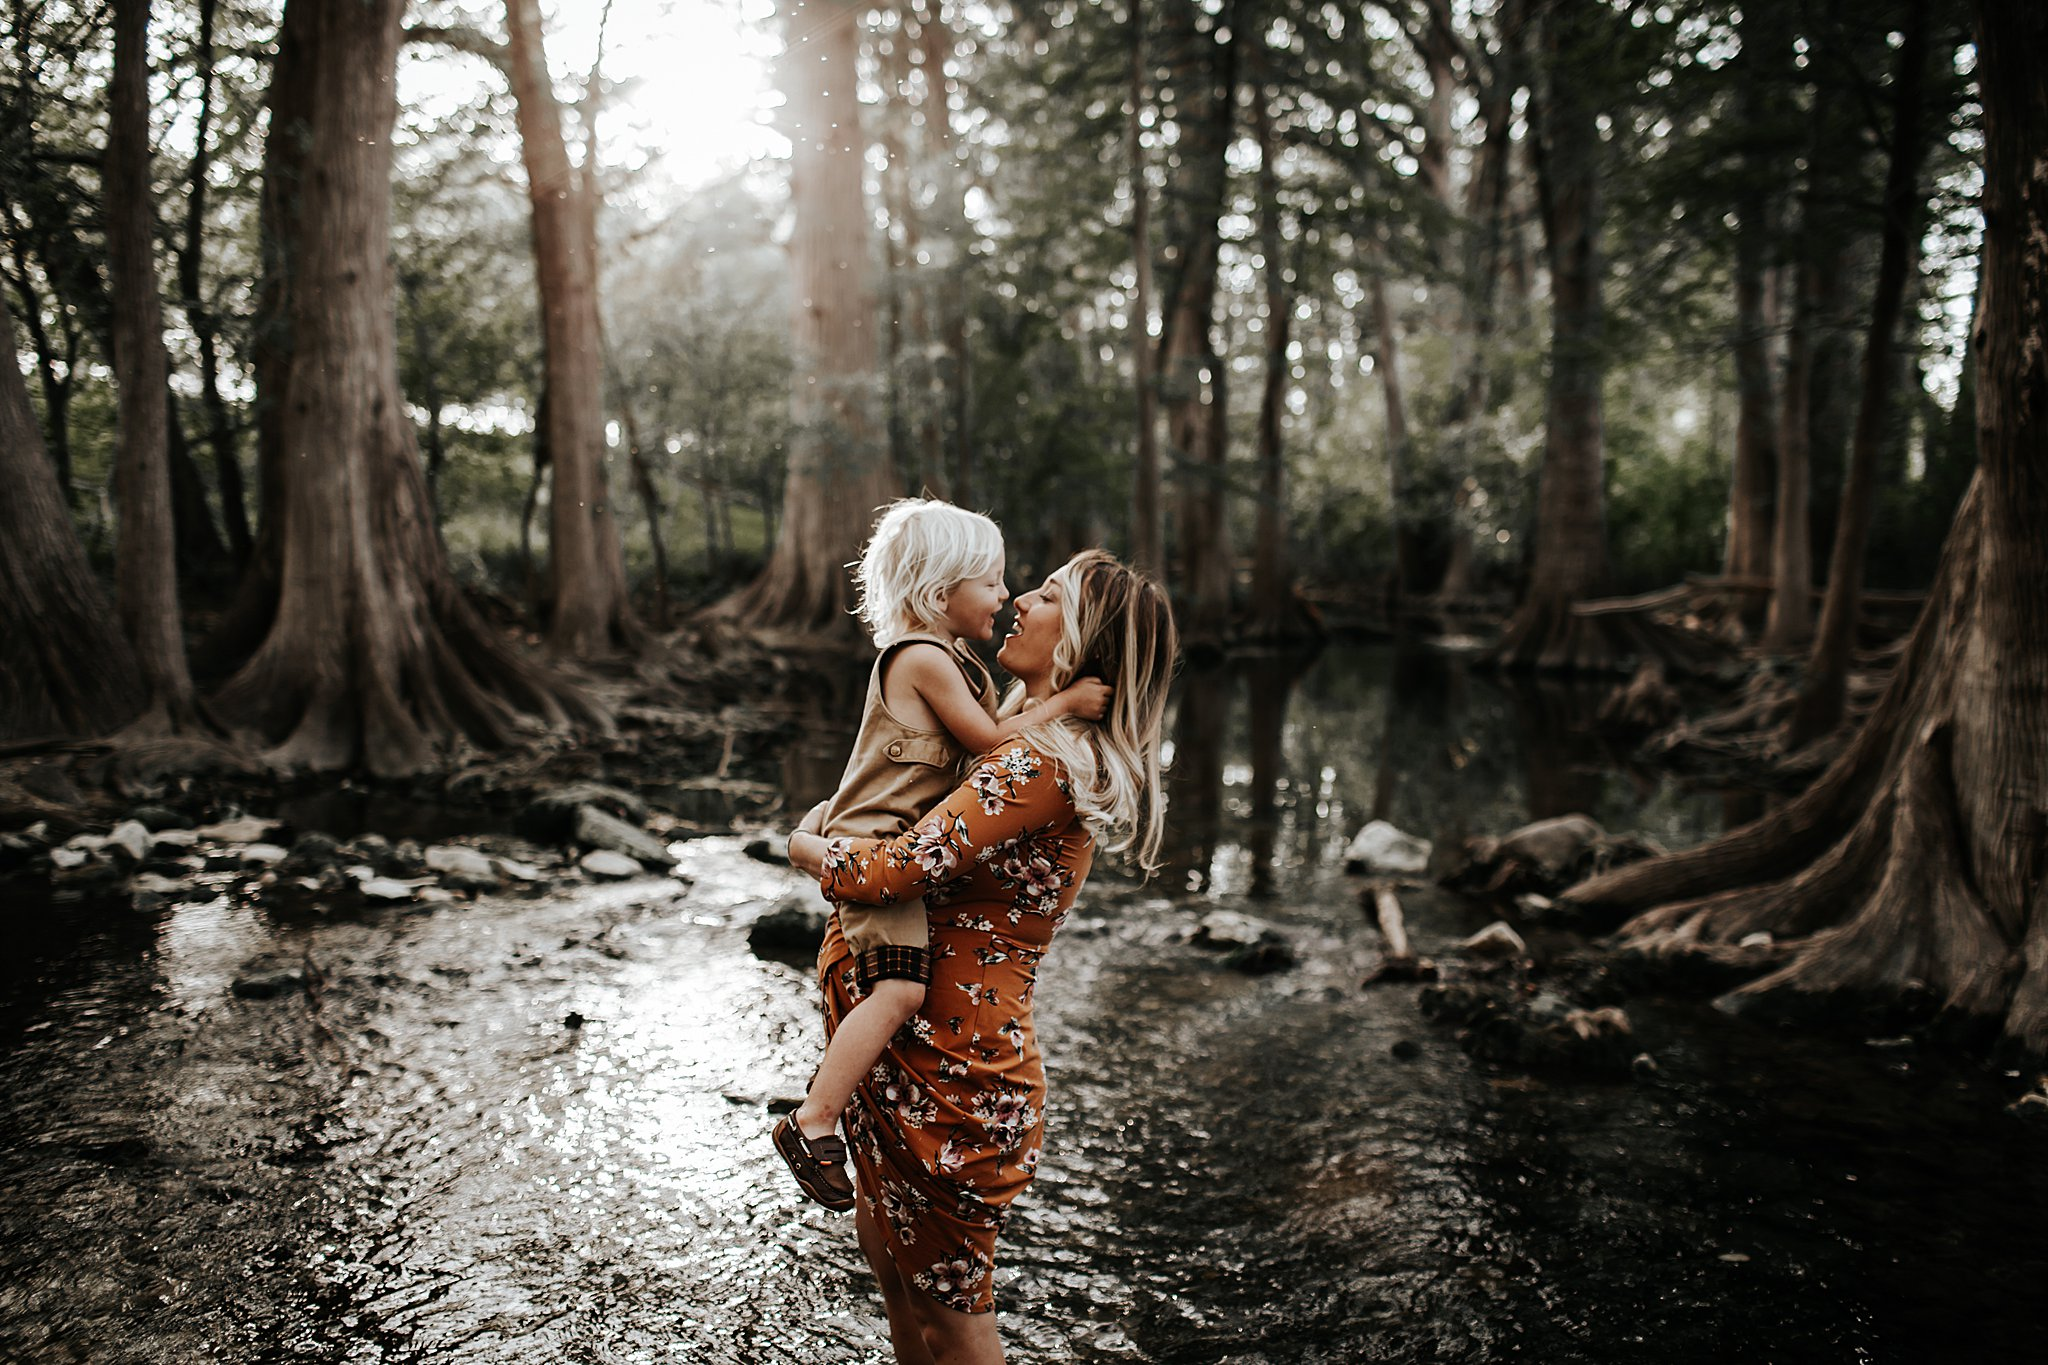 Shannon-San-Antonio-Maternity-Photographer-6_WEB.jpg